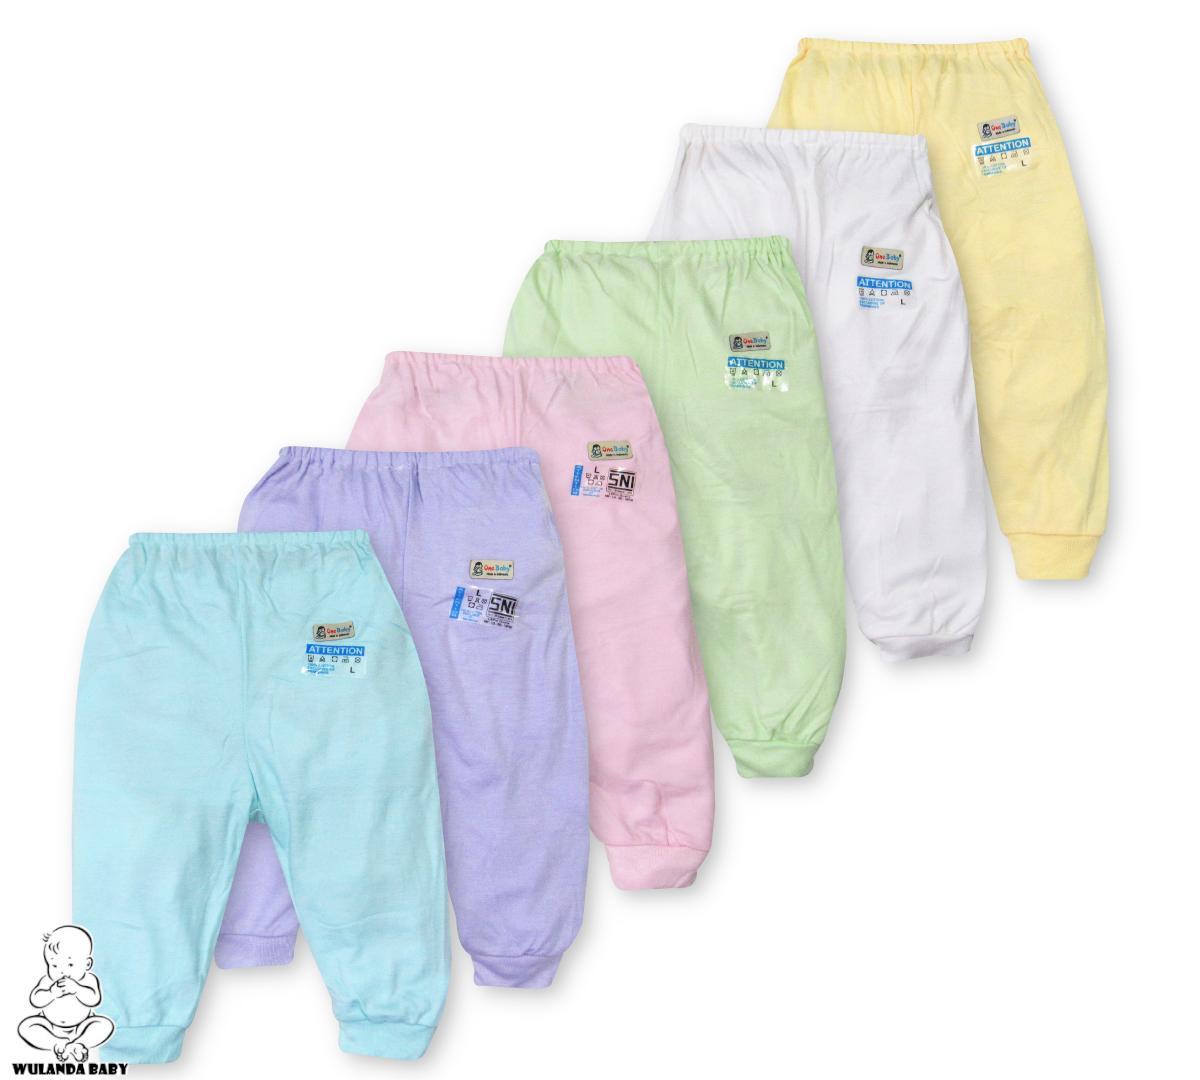 Wulanda 6 Pcs Celana Panjang Anak Bayi Laki Laki Dan Perempuan Warna Polos Yang Berbeda One Baby By Wulanda Baby.